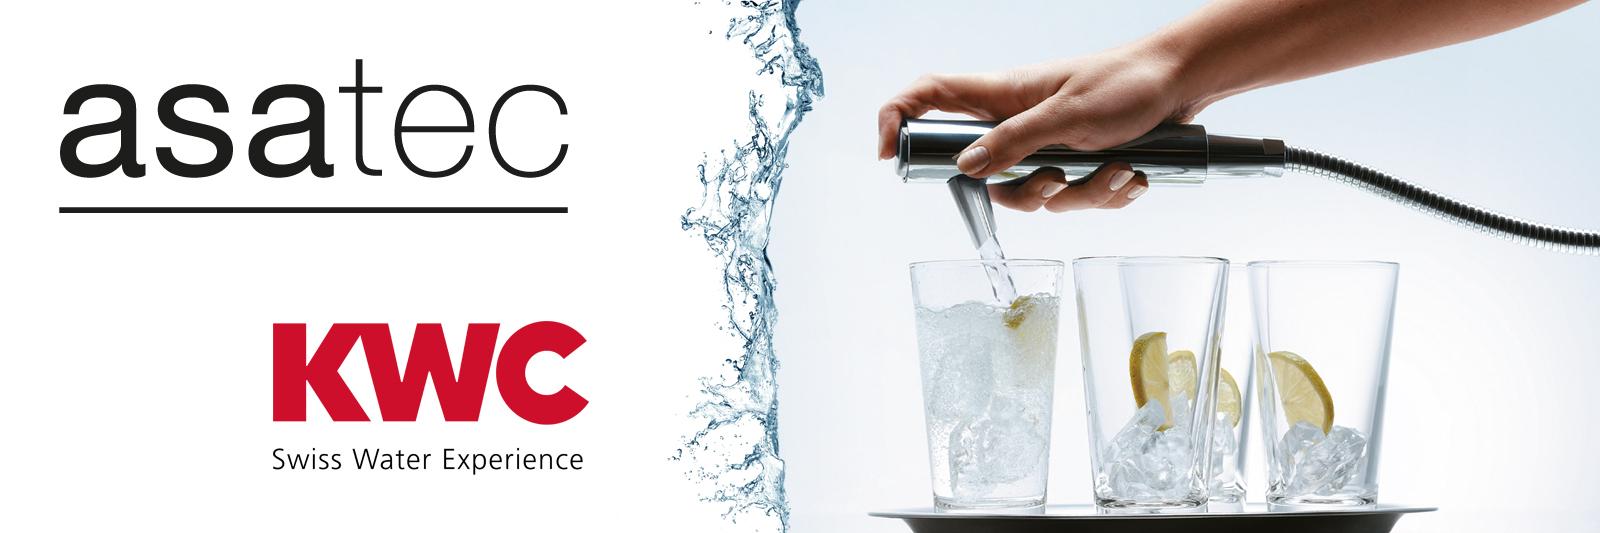 Asatec Ag Wasserspender Wasserfilter Fur Jede Anwendung